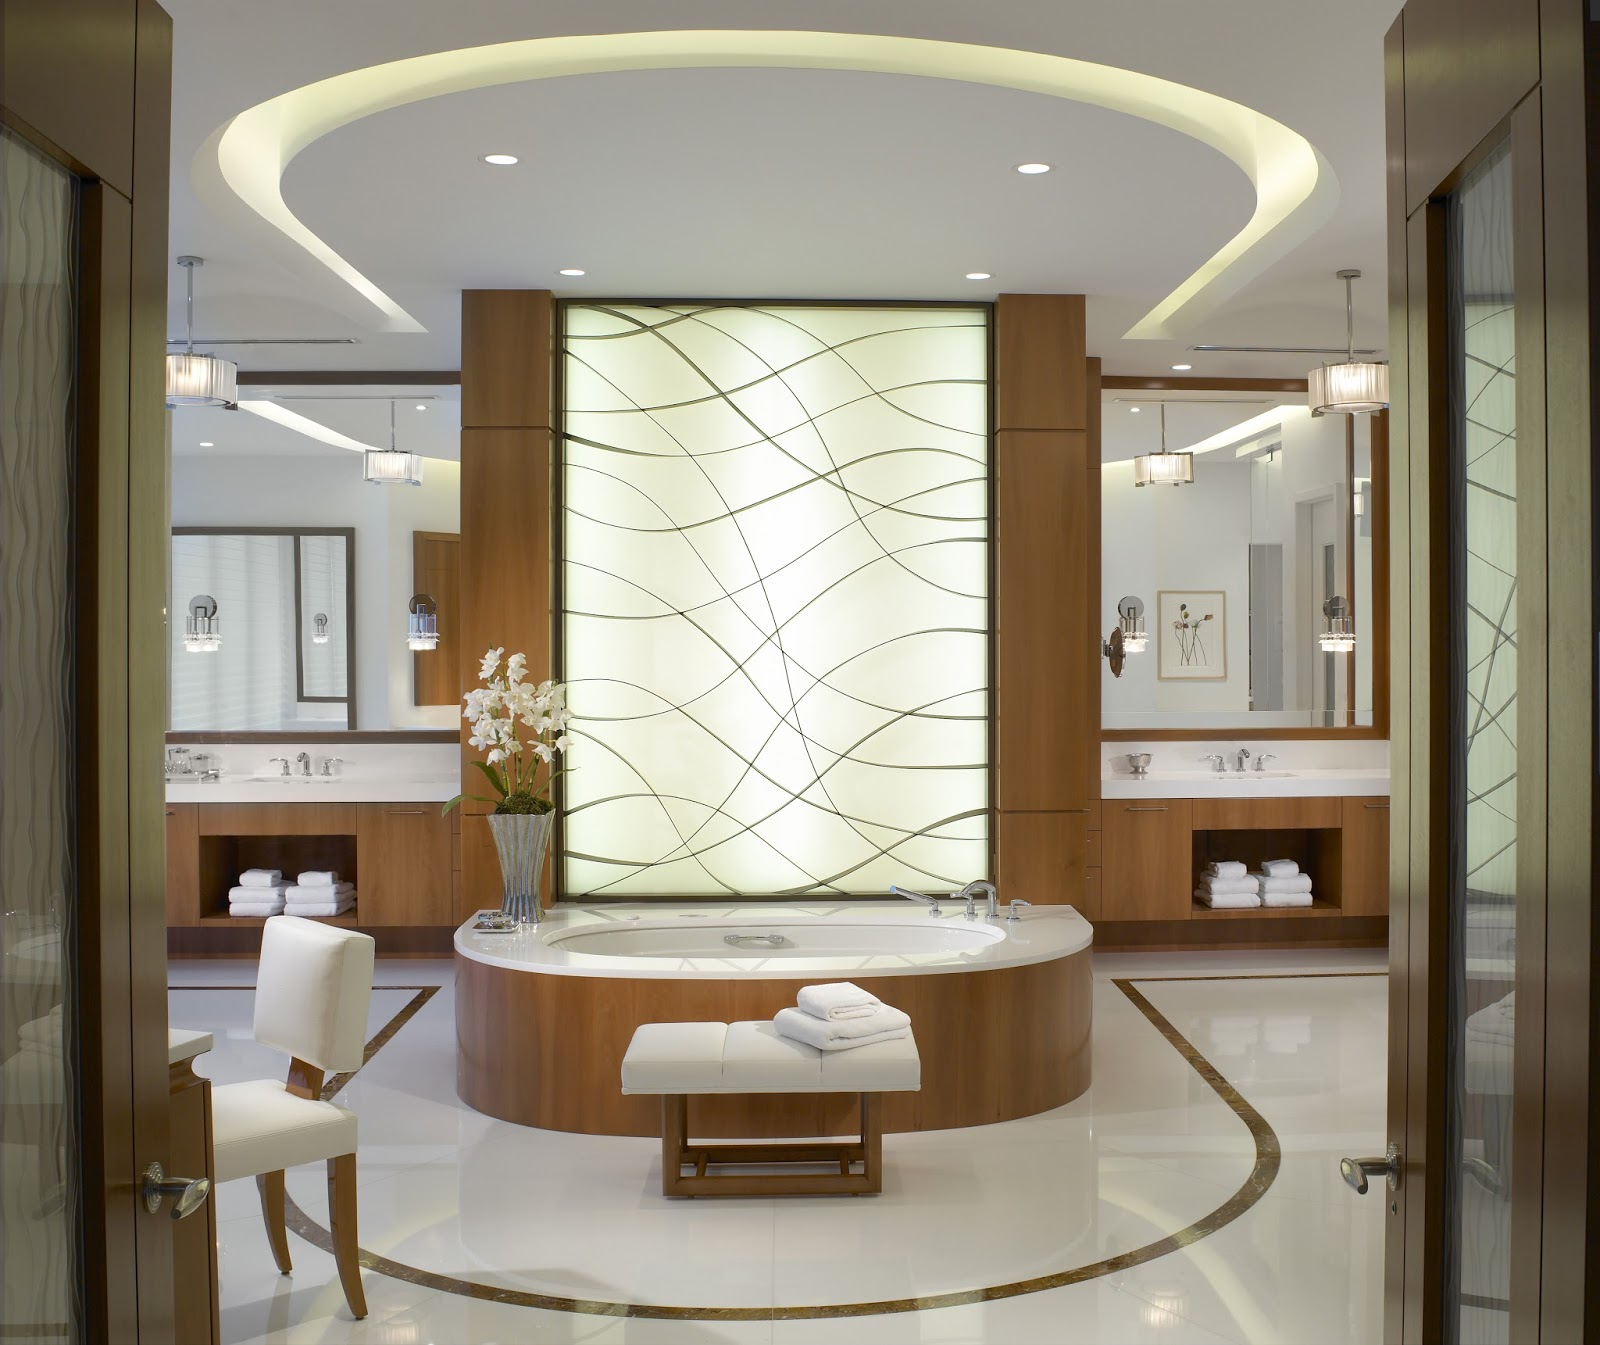 alene workman interior design: Tips to Creating a ... on Small:e_D8Ihxdoce= Bathroom Ideas  id=19124